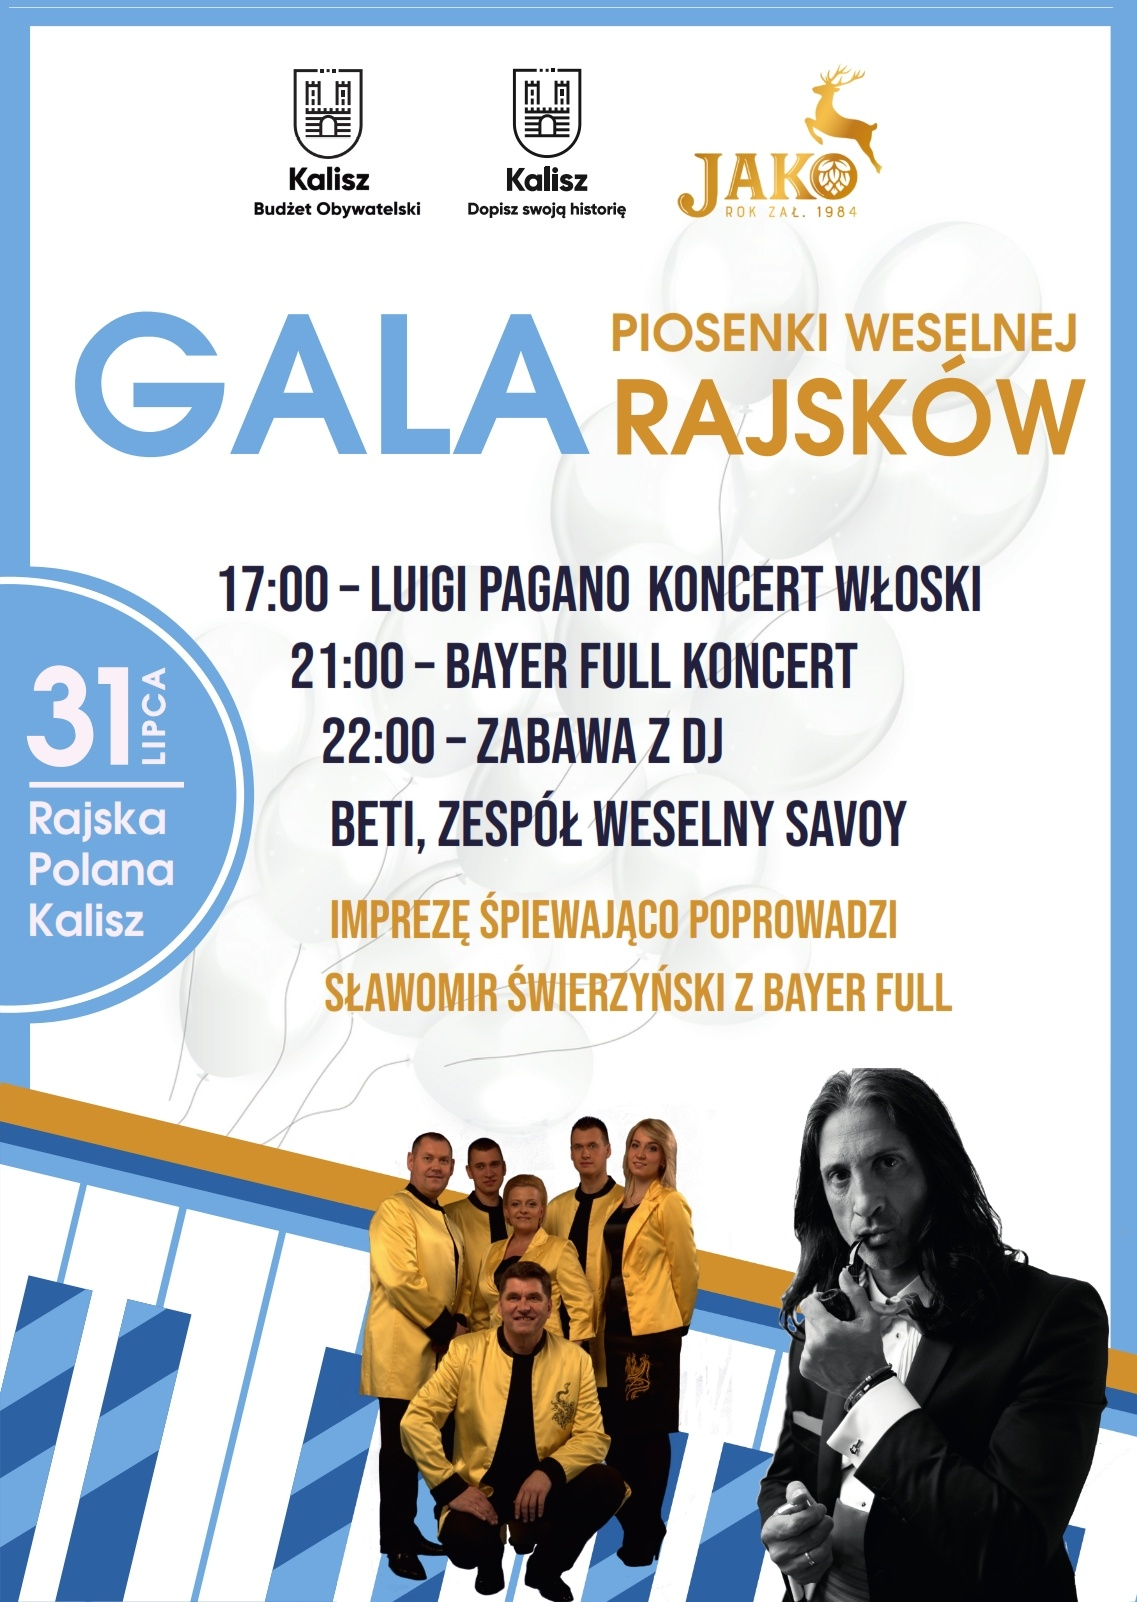 bayer full - Gala Piosenki Weselnej!